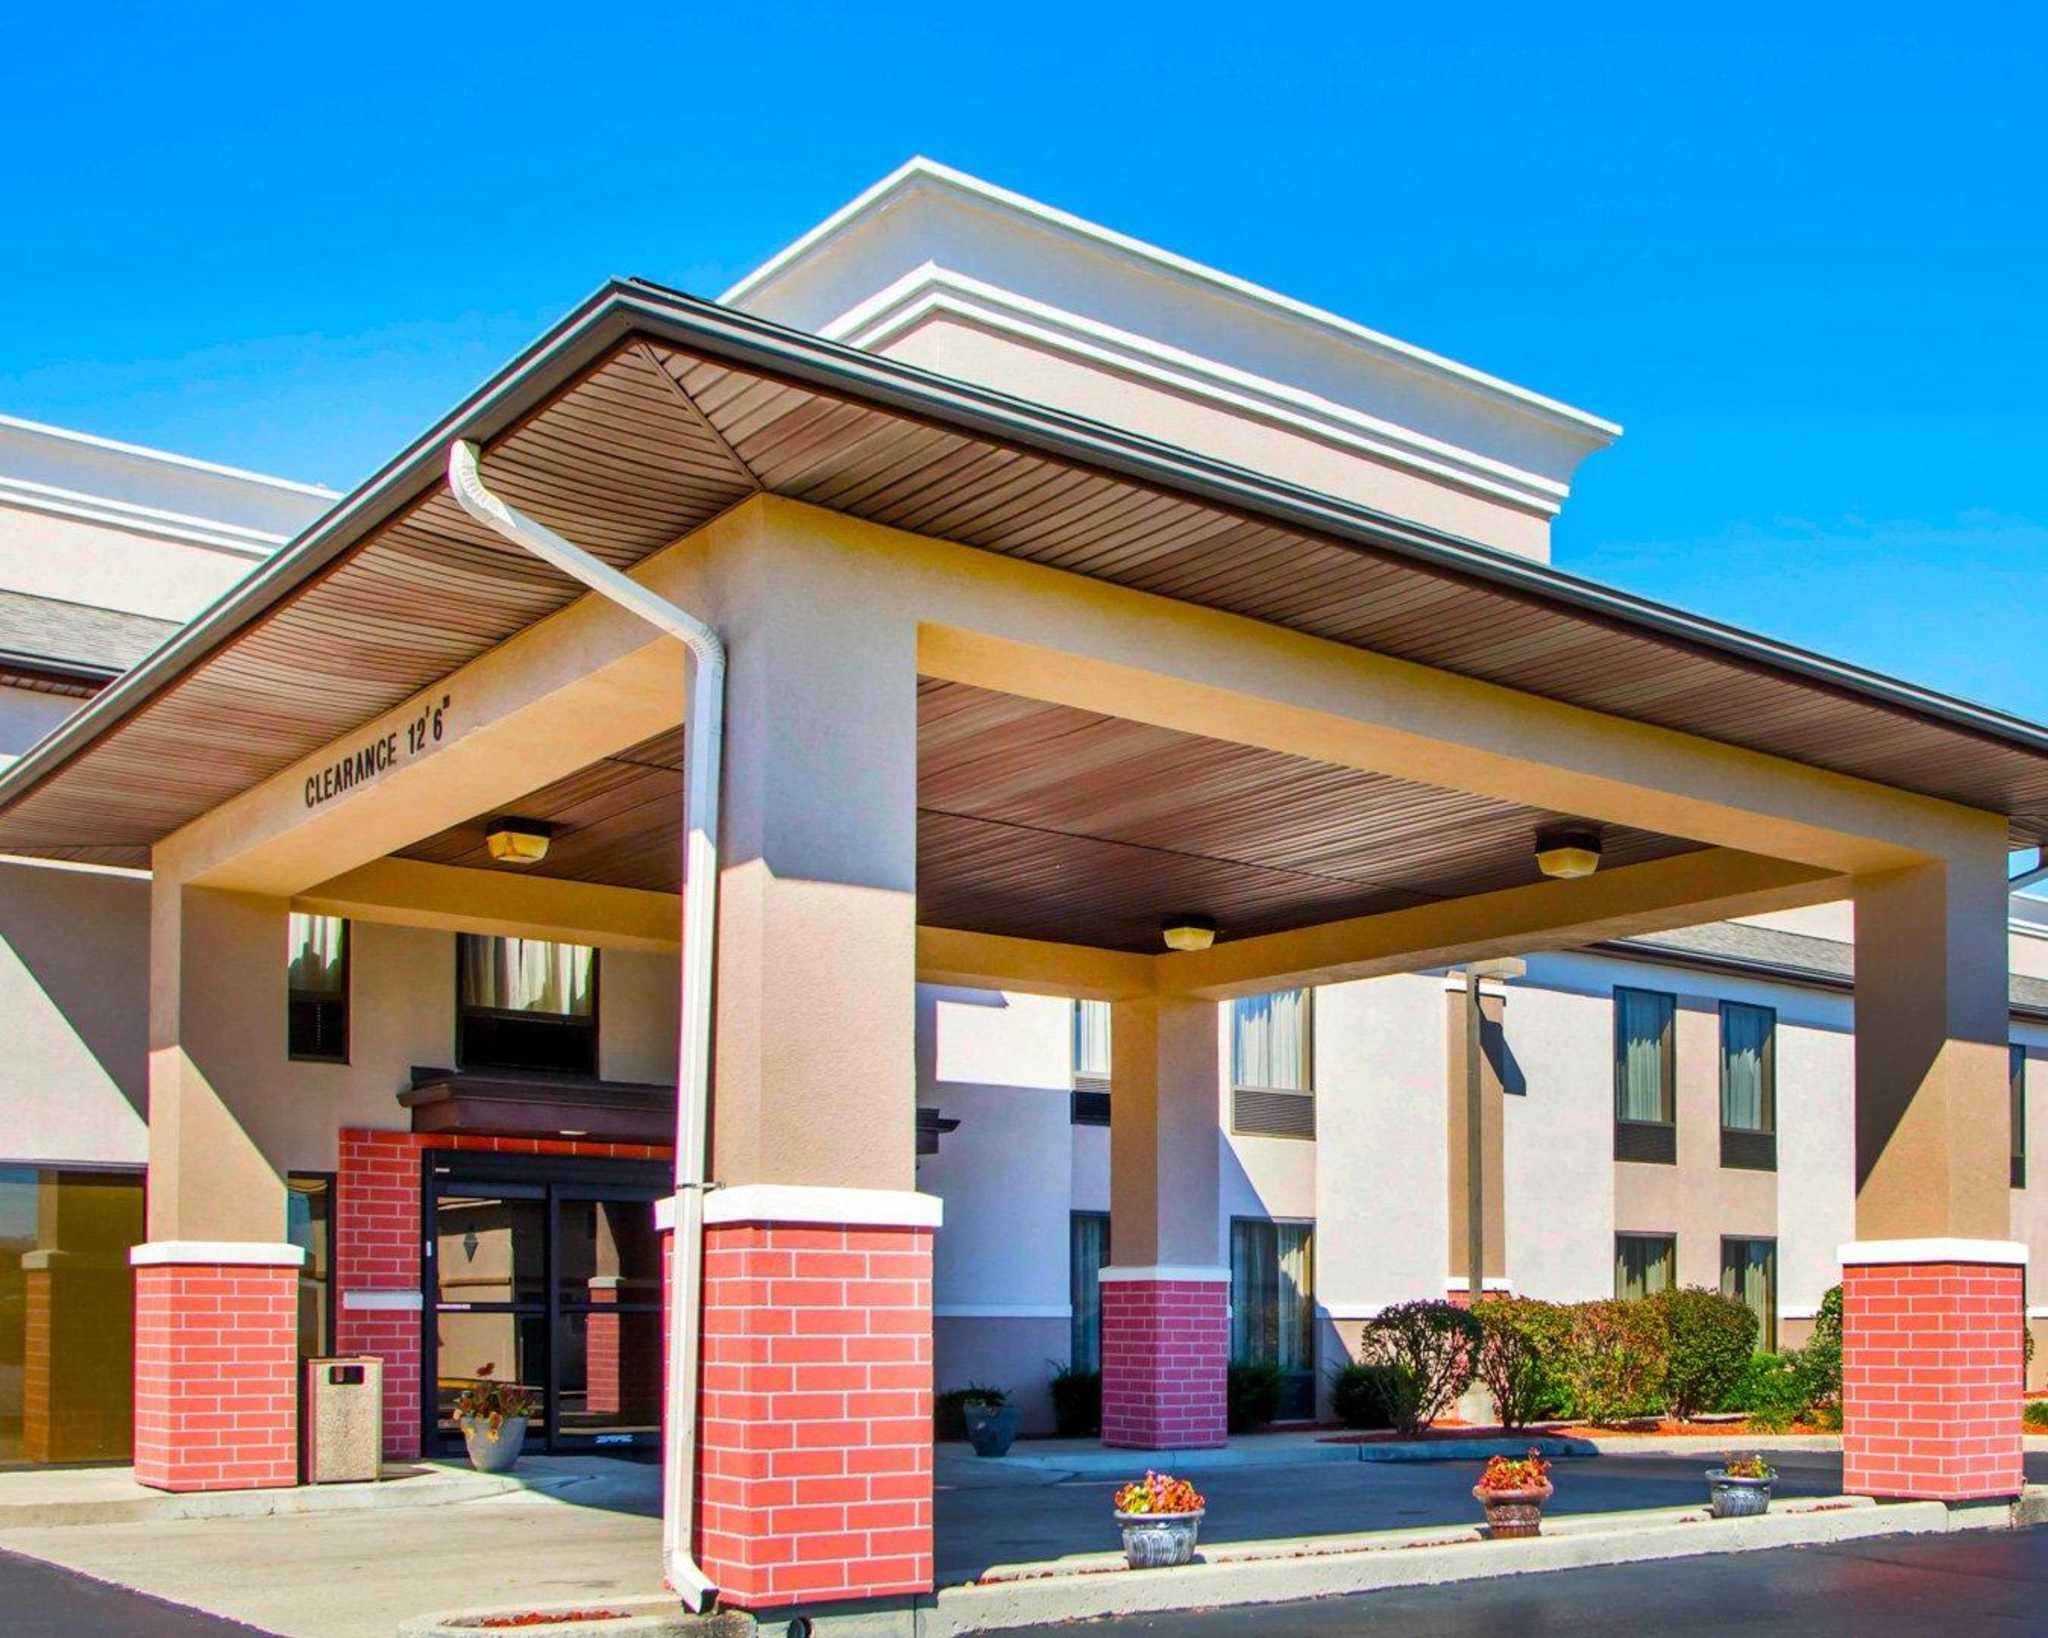 Comfort Inn Dayton - Huber Heights image 3